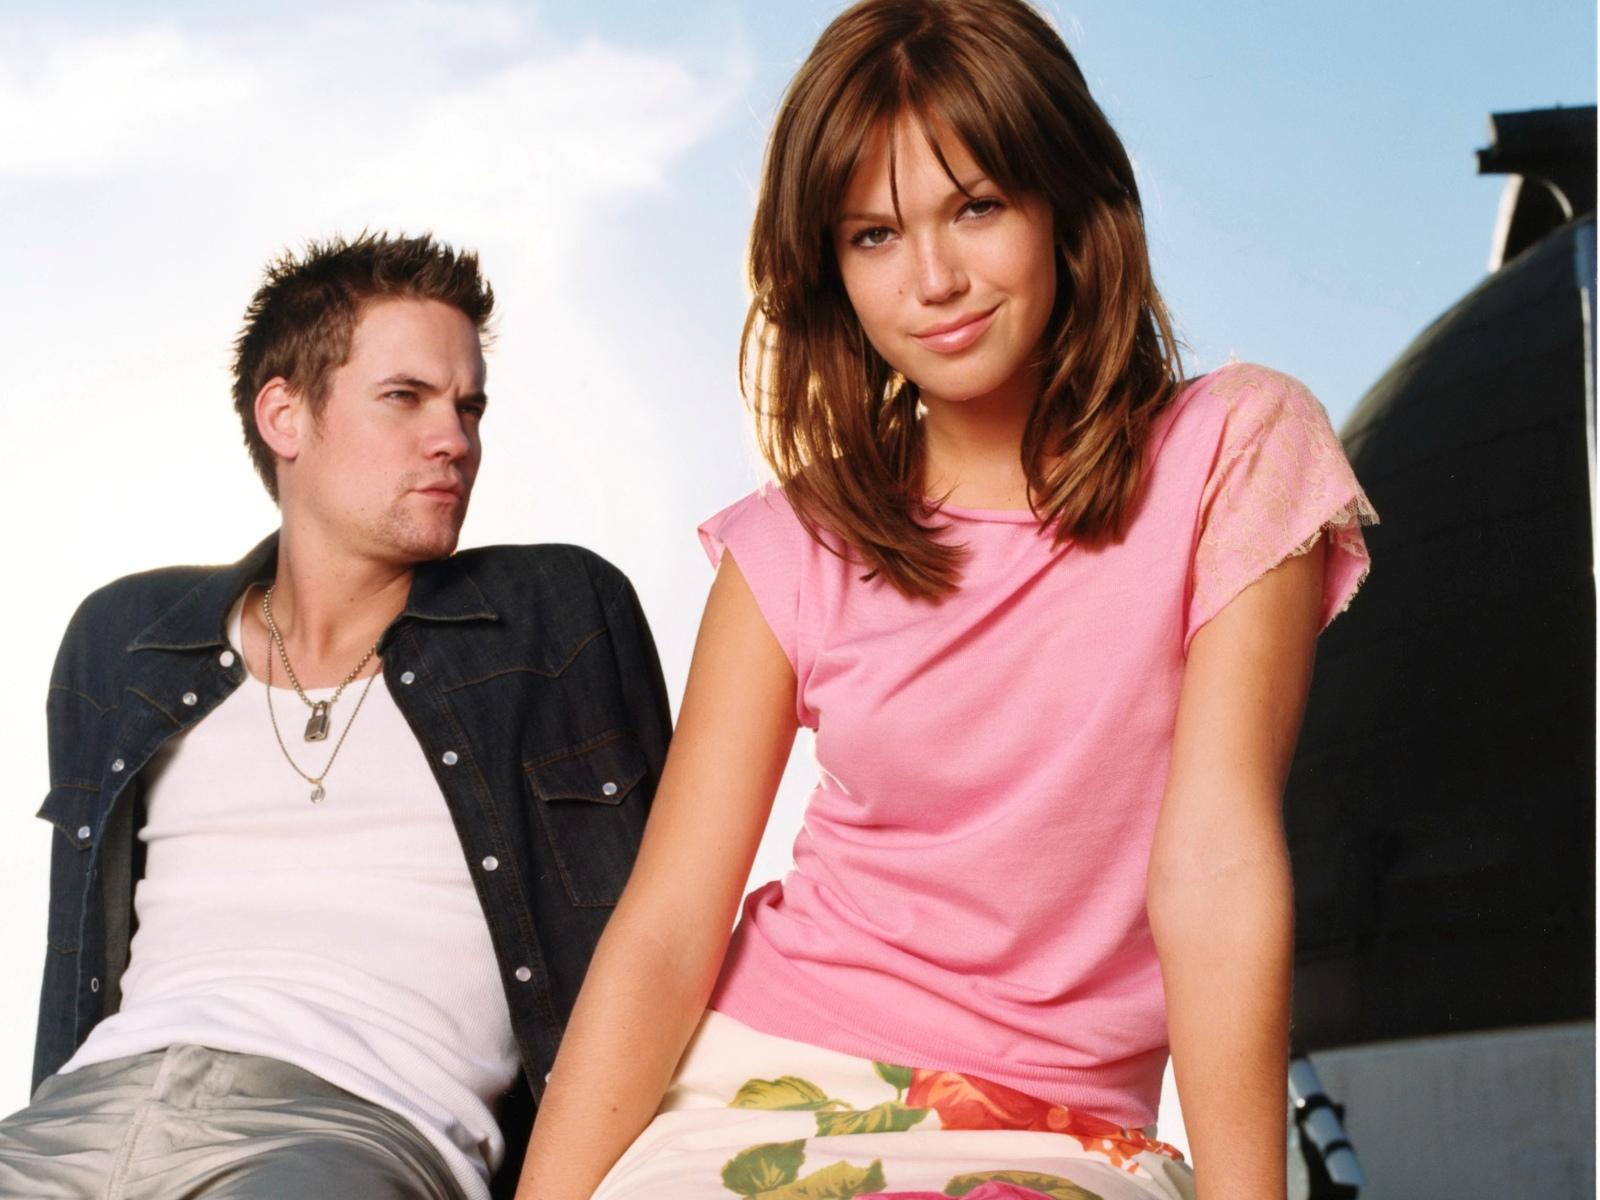 http://3.bp.blogspot.com/_DmZYLi-ezCw/TDAwFQS_h-I/AAAAAAAACSY/muy9JcpmJKY/s1600/a+walk+to+remember+cast+couple.jpg